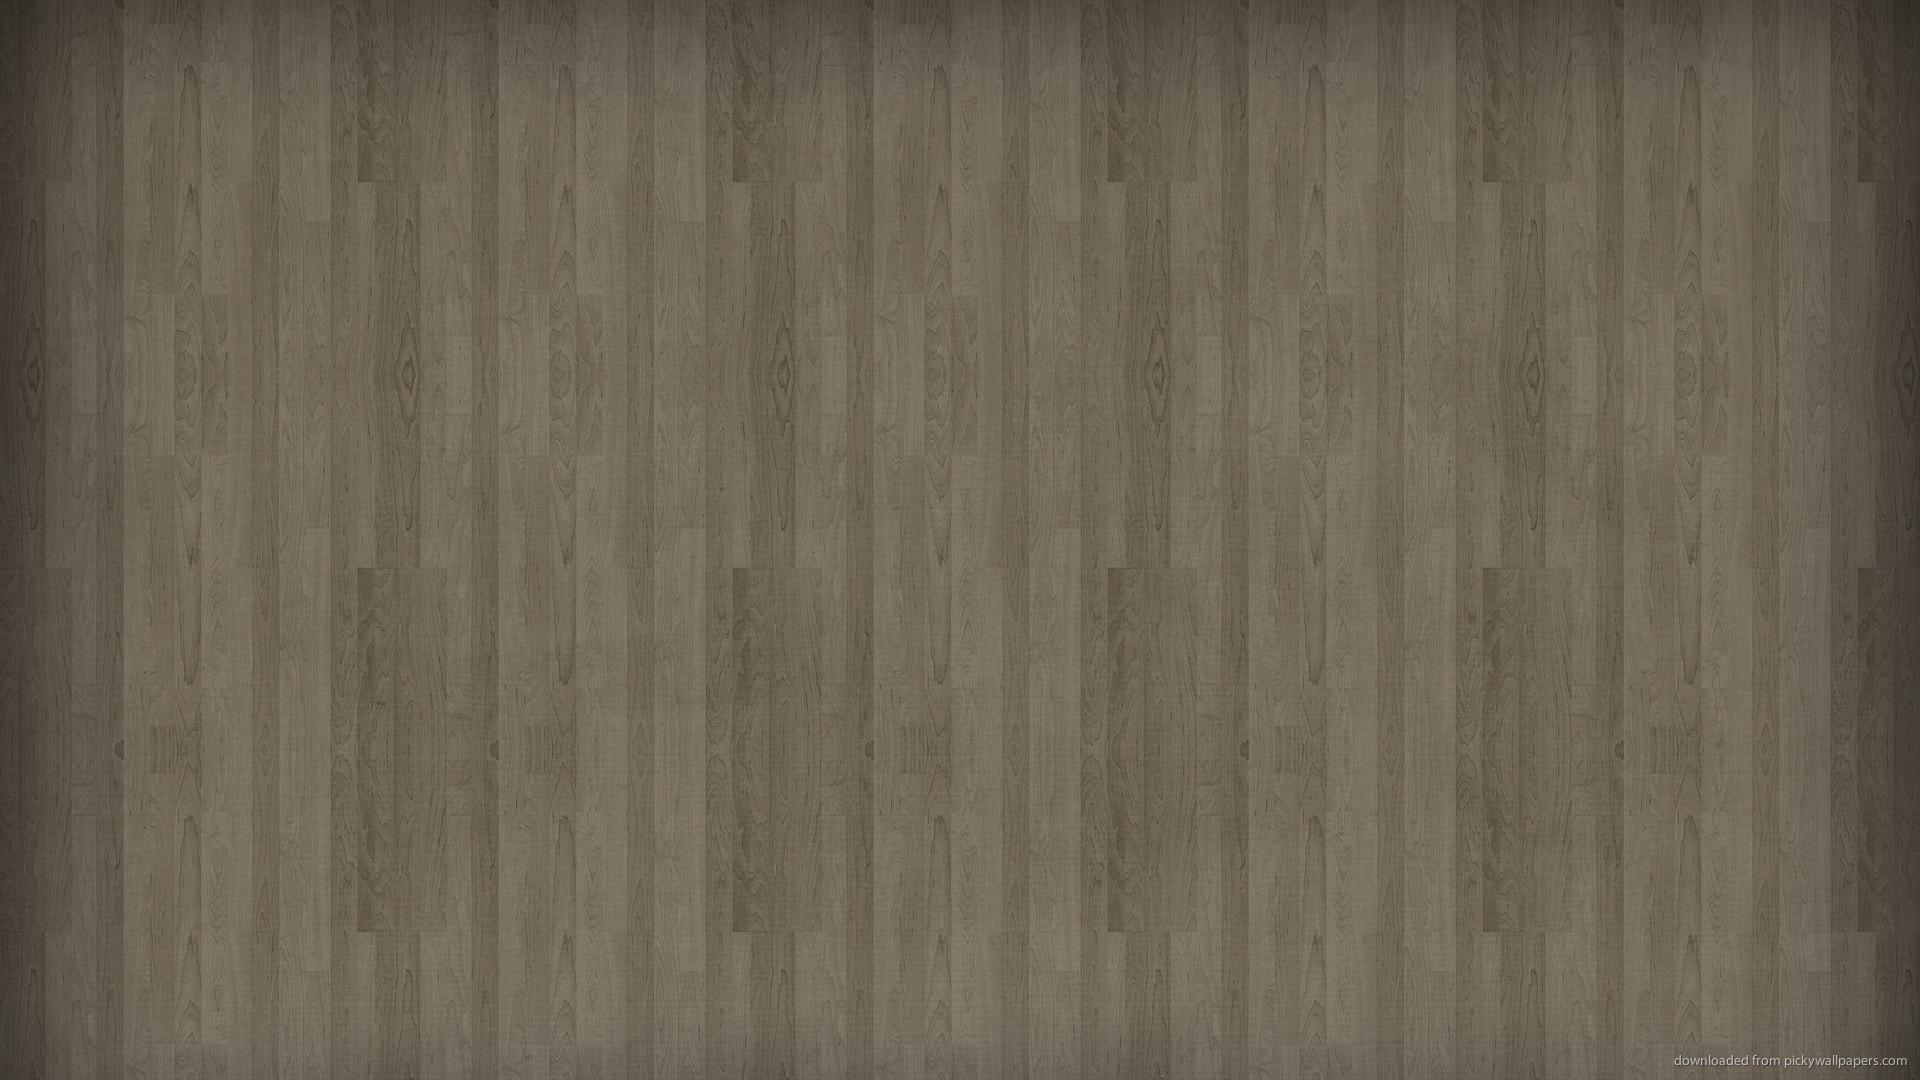 Res: 1920x1080, Light Gray Wood Flooring Texture And Download x Grey Wooden Floor Pattern  Wallpaper